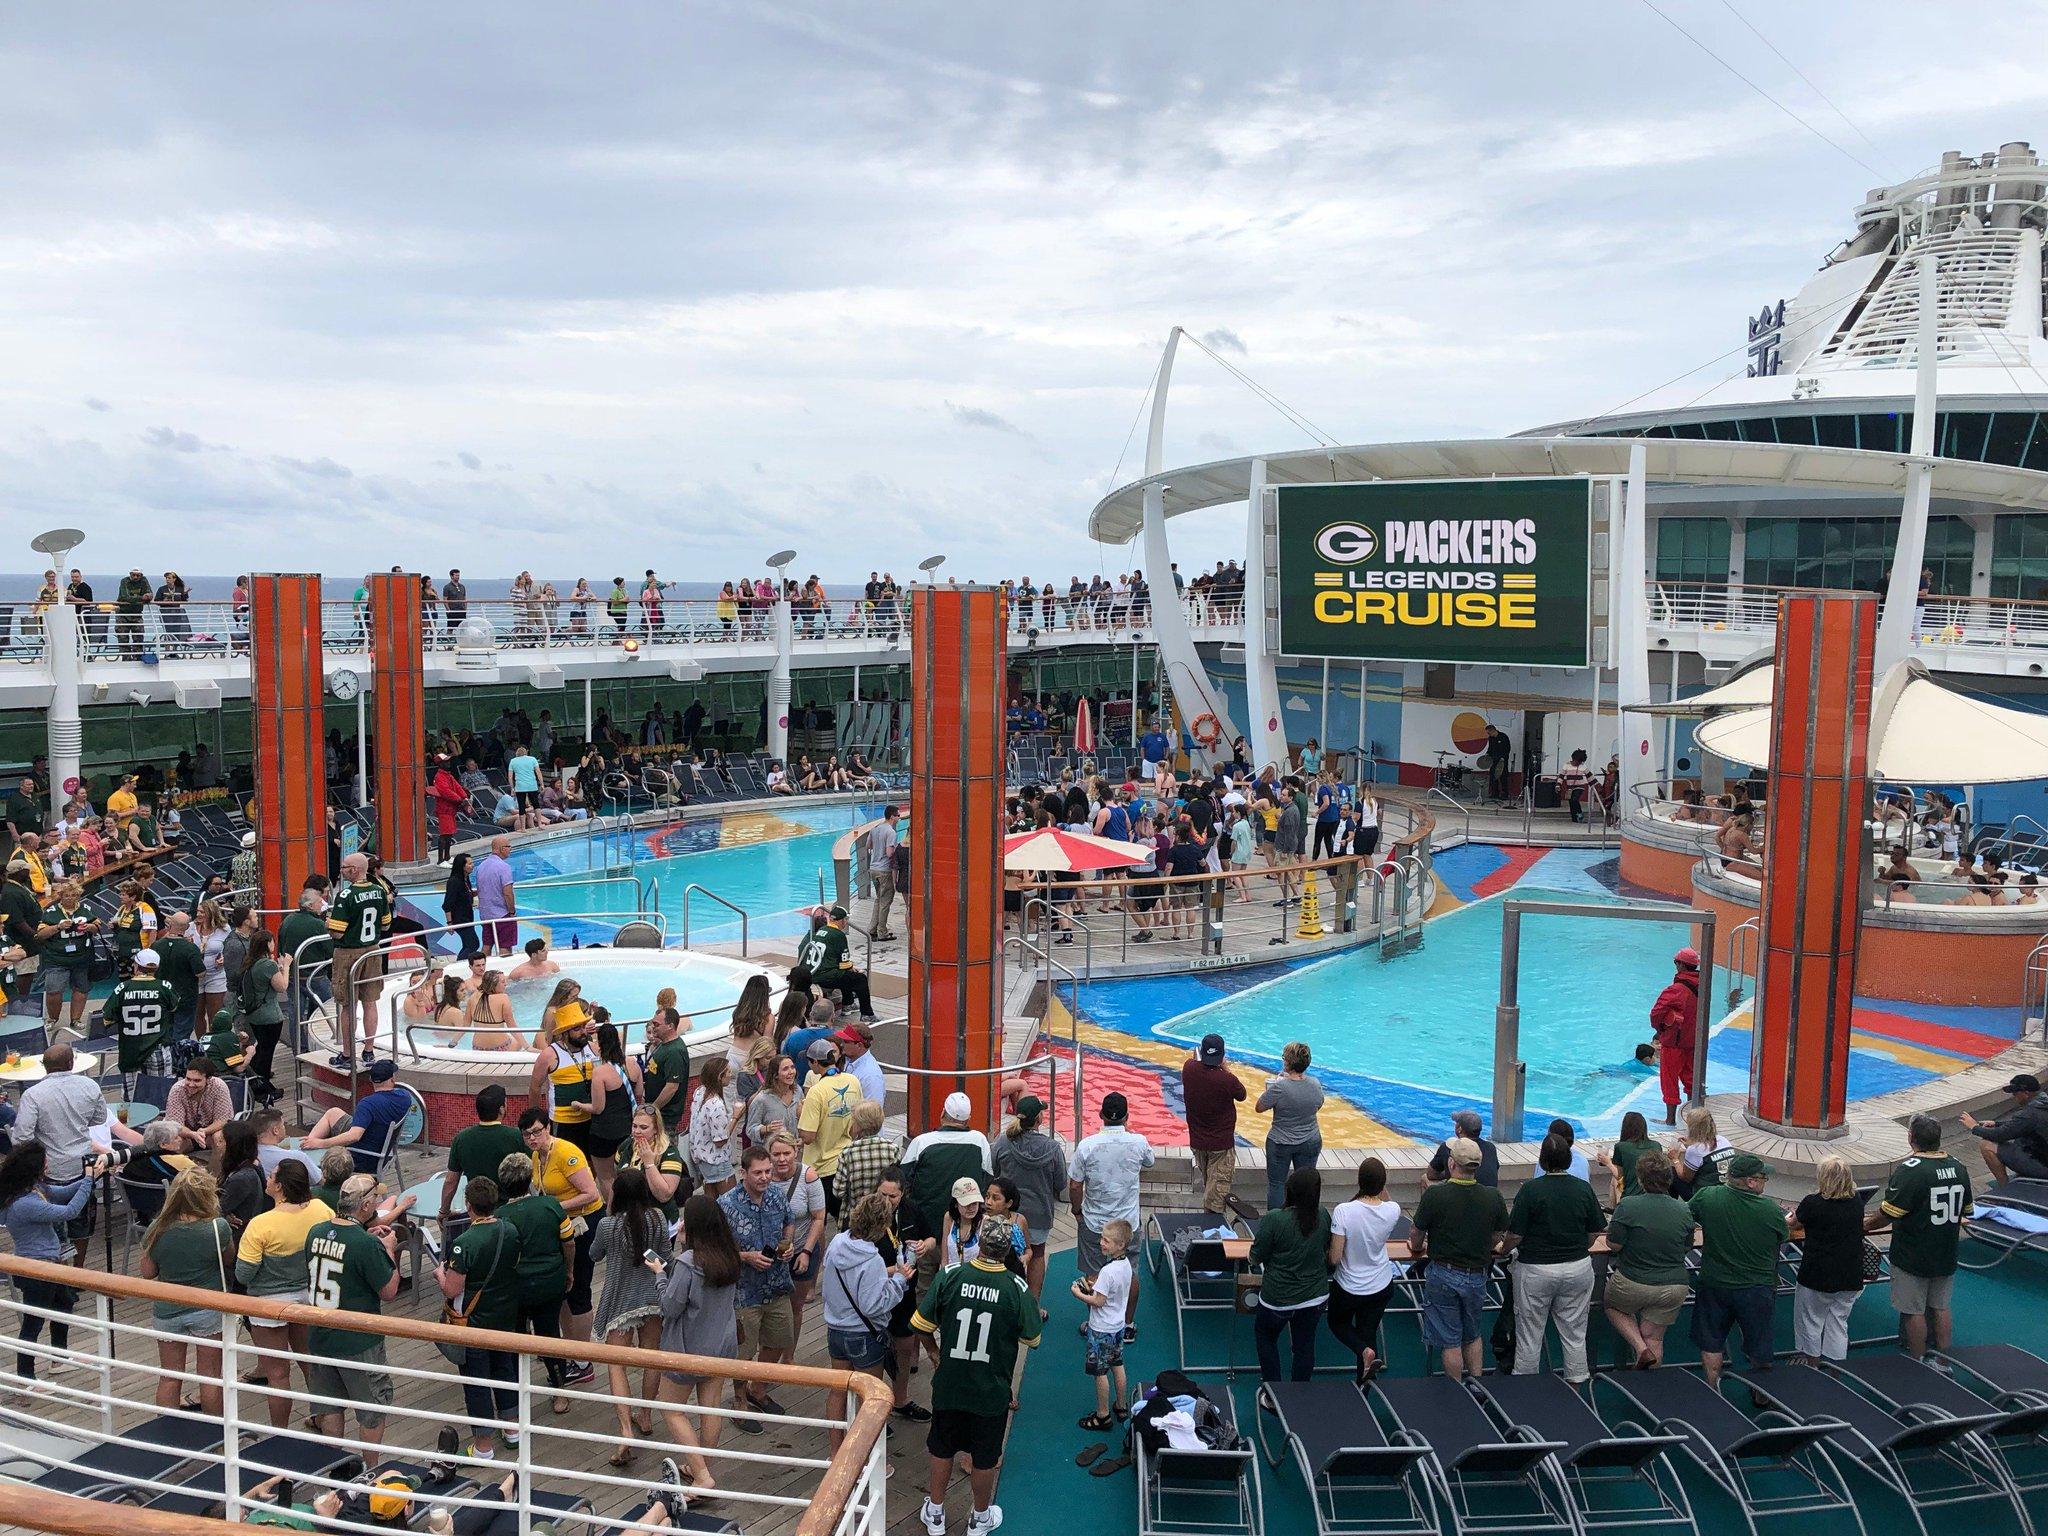 All aboard! ��️  The #PackersCruise set sail today ��: https://t.co/QBpJj6KHFI https://t.co/UE46EE59Lq